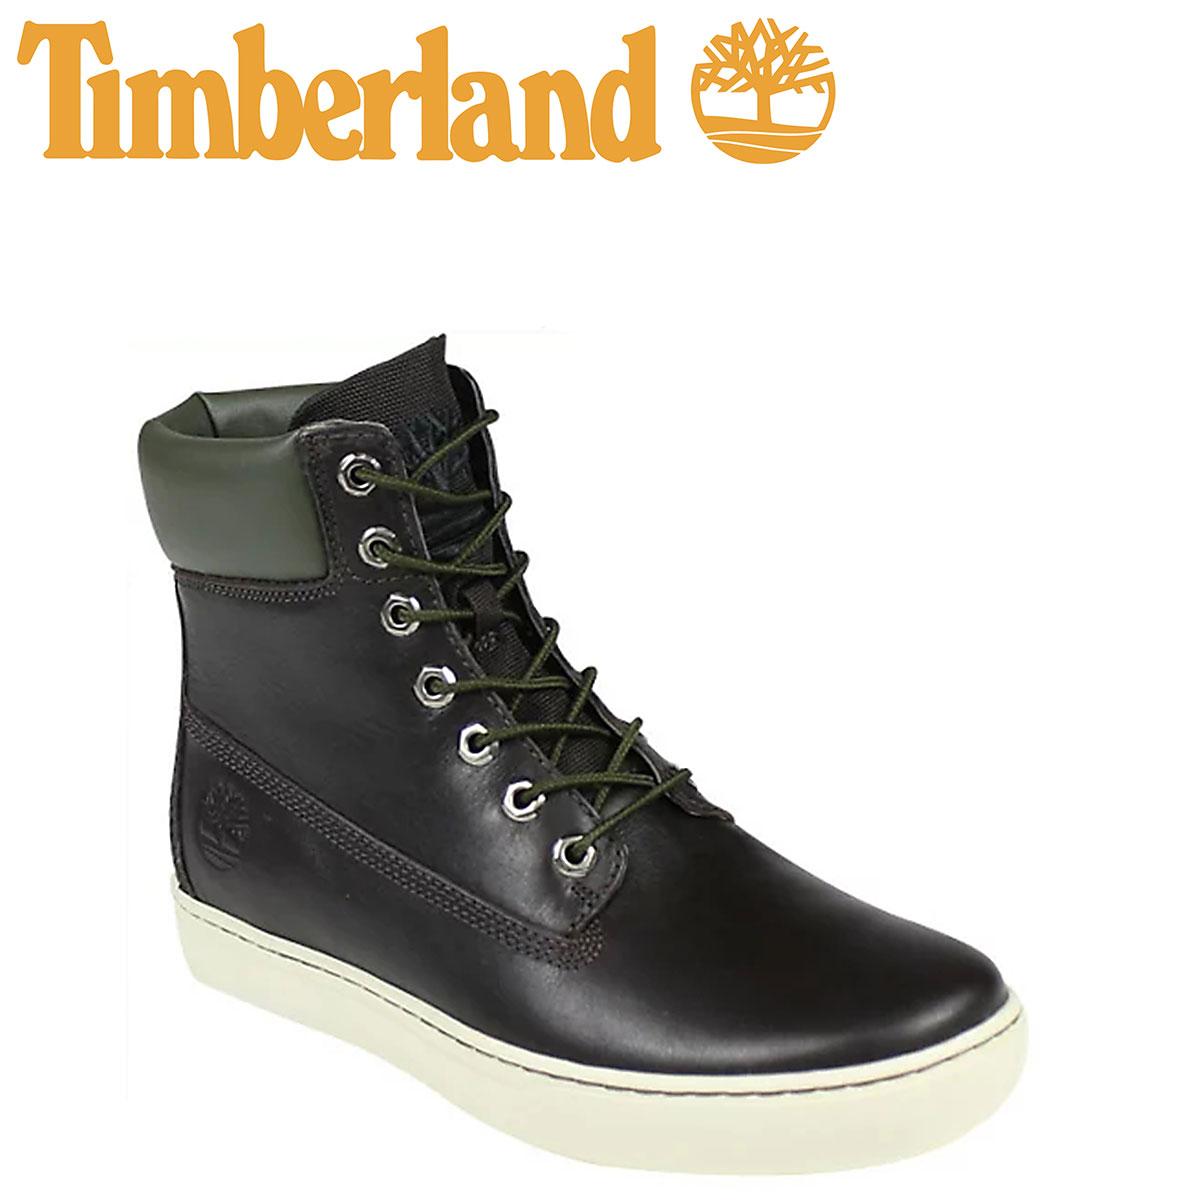 Timberland ティンバーランド 6INCH 6インチ ブーツ NEWMARKET 2.0 CUPSOLE 6 INCH BOOT 6810A Wワイズ メンズ